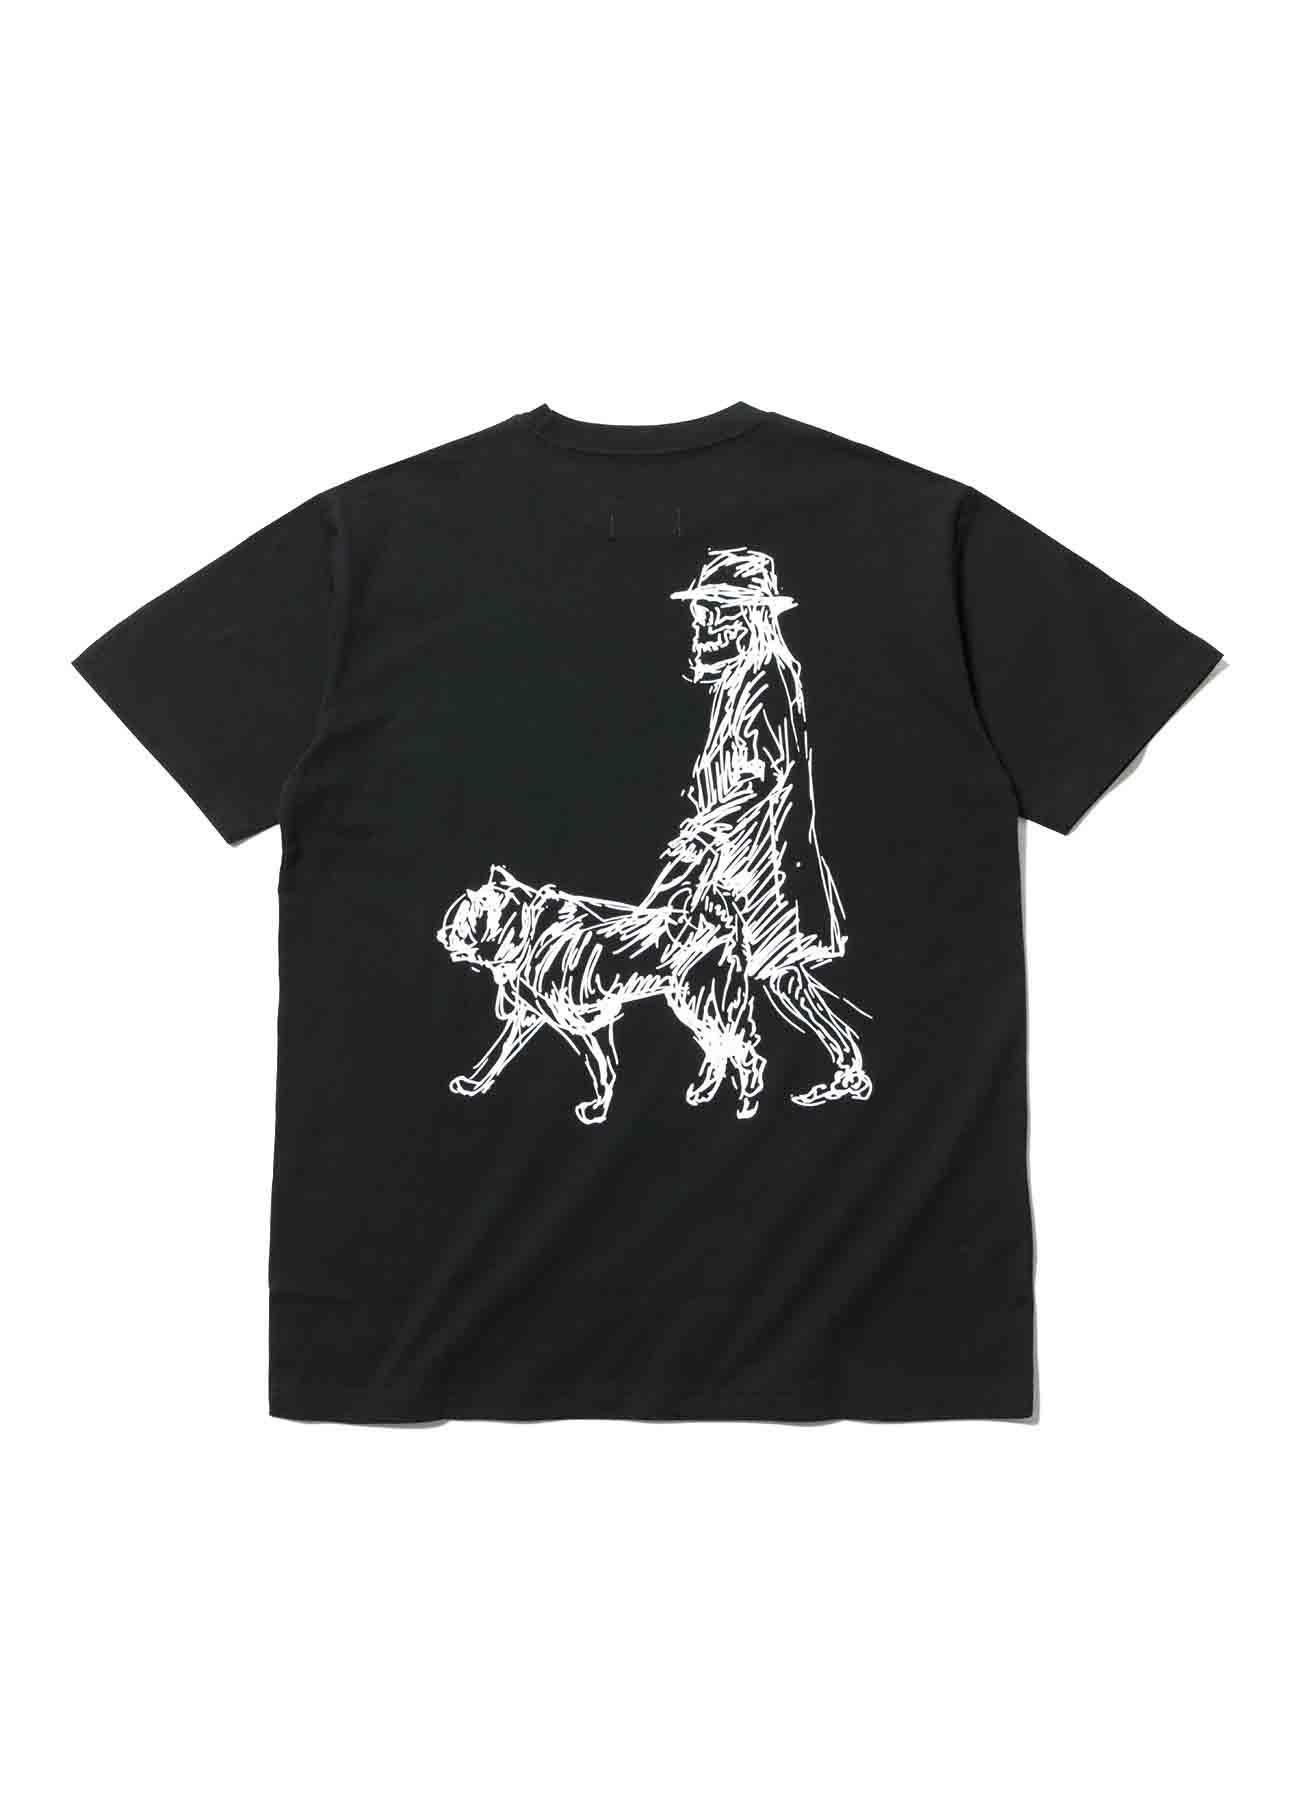 Yohji Yamamoto × New Era 反転ロゴ Yuuka Asakura バックプリント半袖TEE